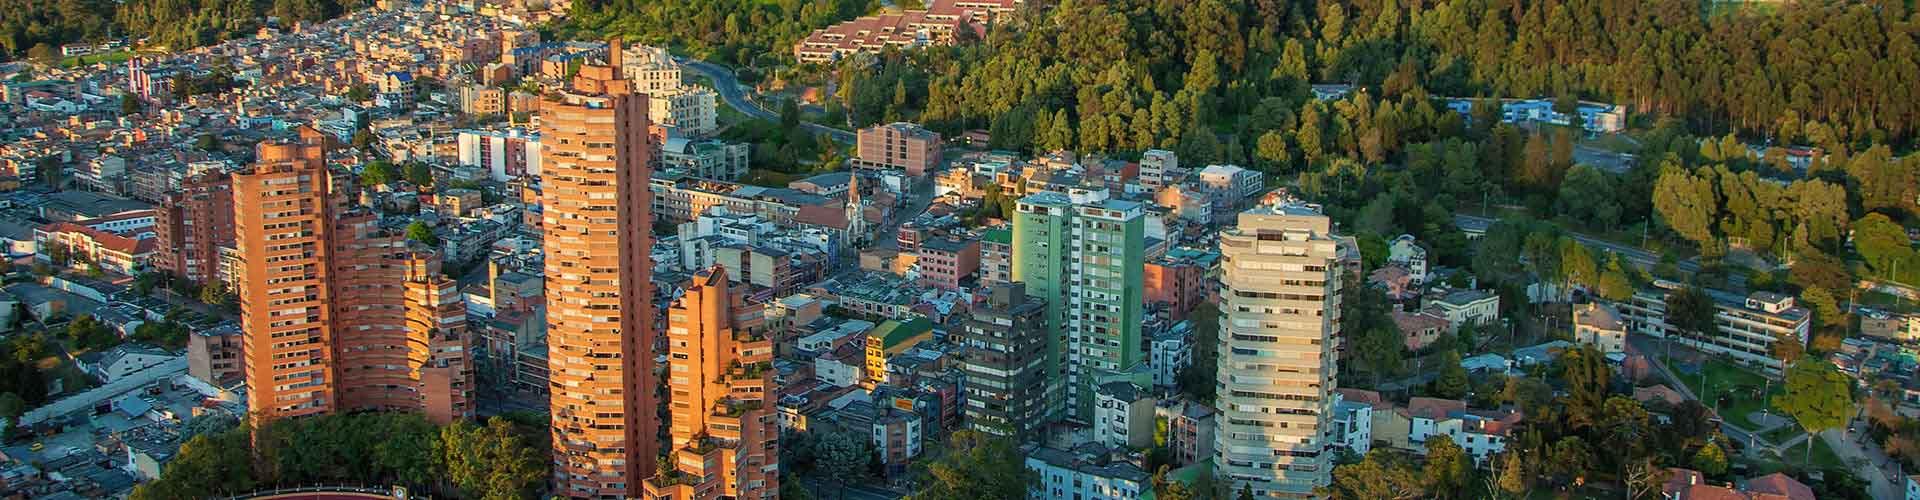 Bogotá - Apartamentos en Bogotá. Mapas de Bogotá, Fotos y comentarios de cada Apartamento en Bogotá.